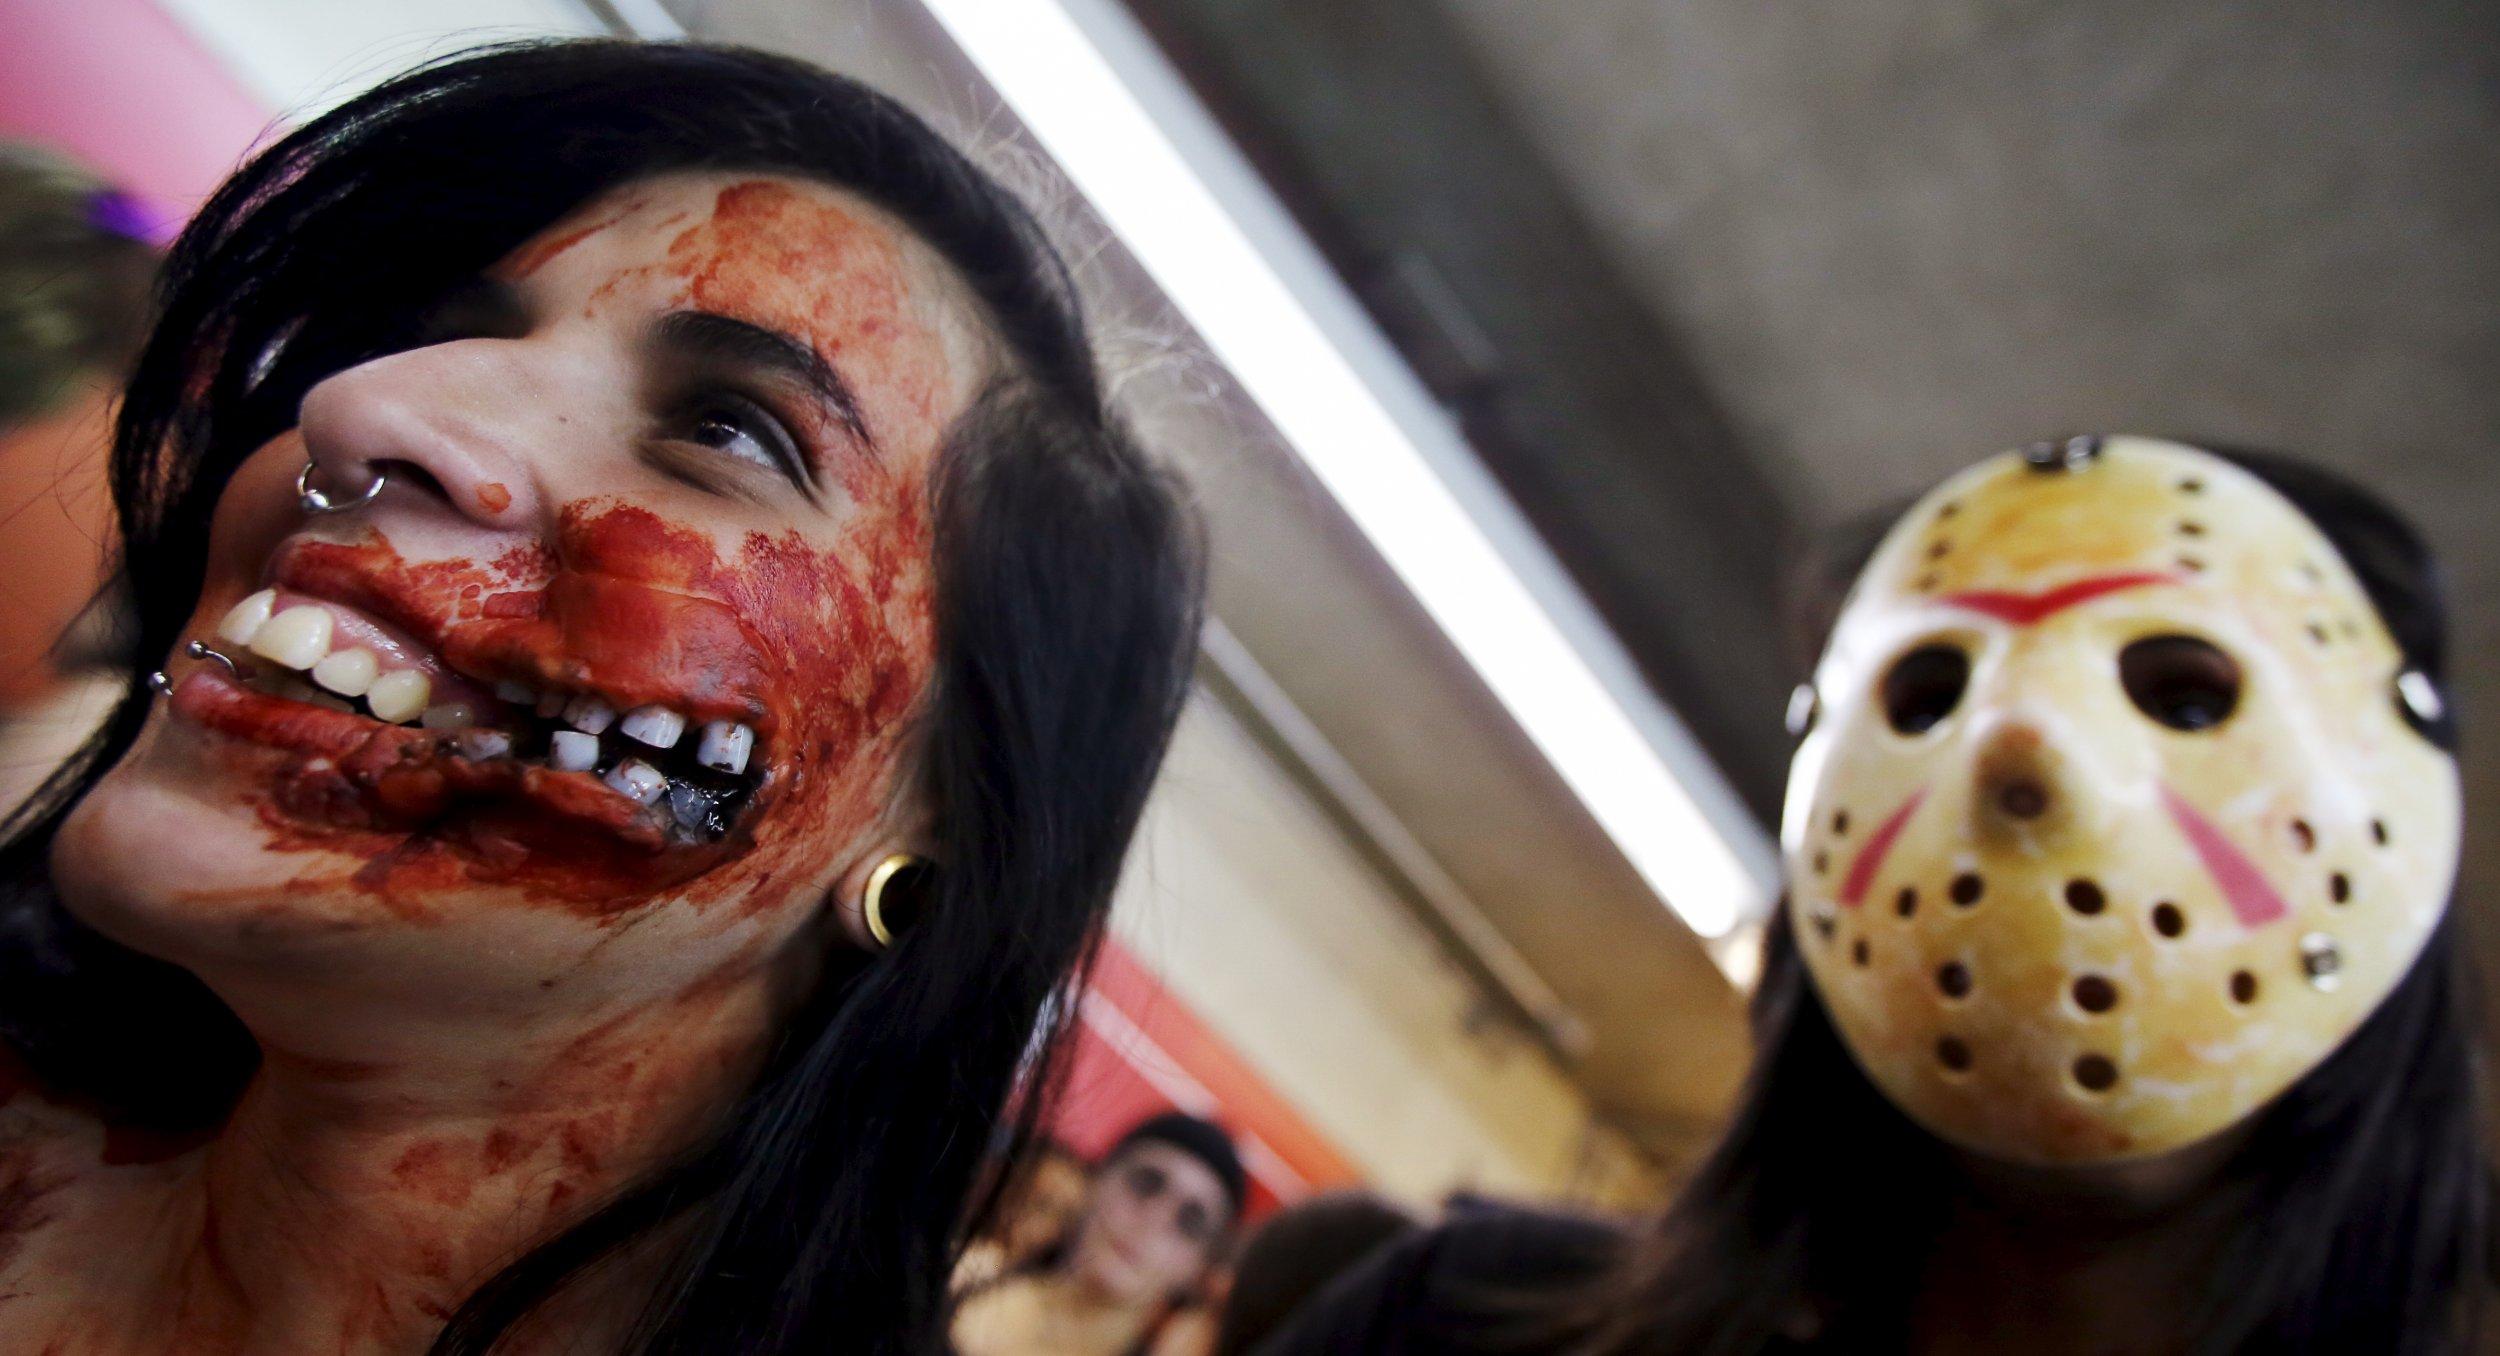 Amazon Zombie Apocalypse terms and conditions